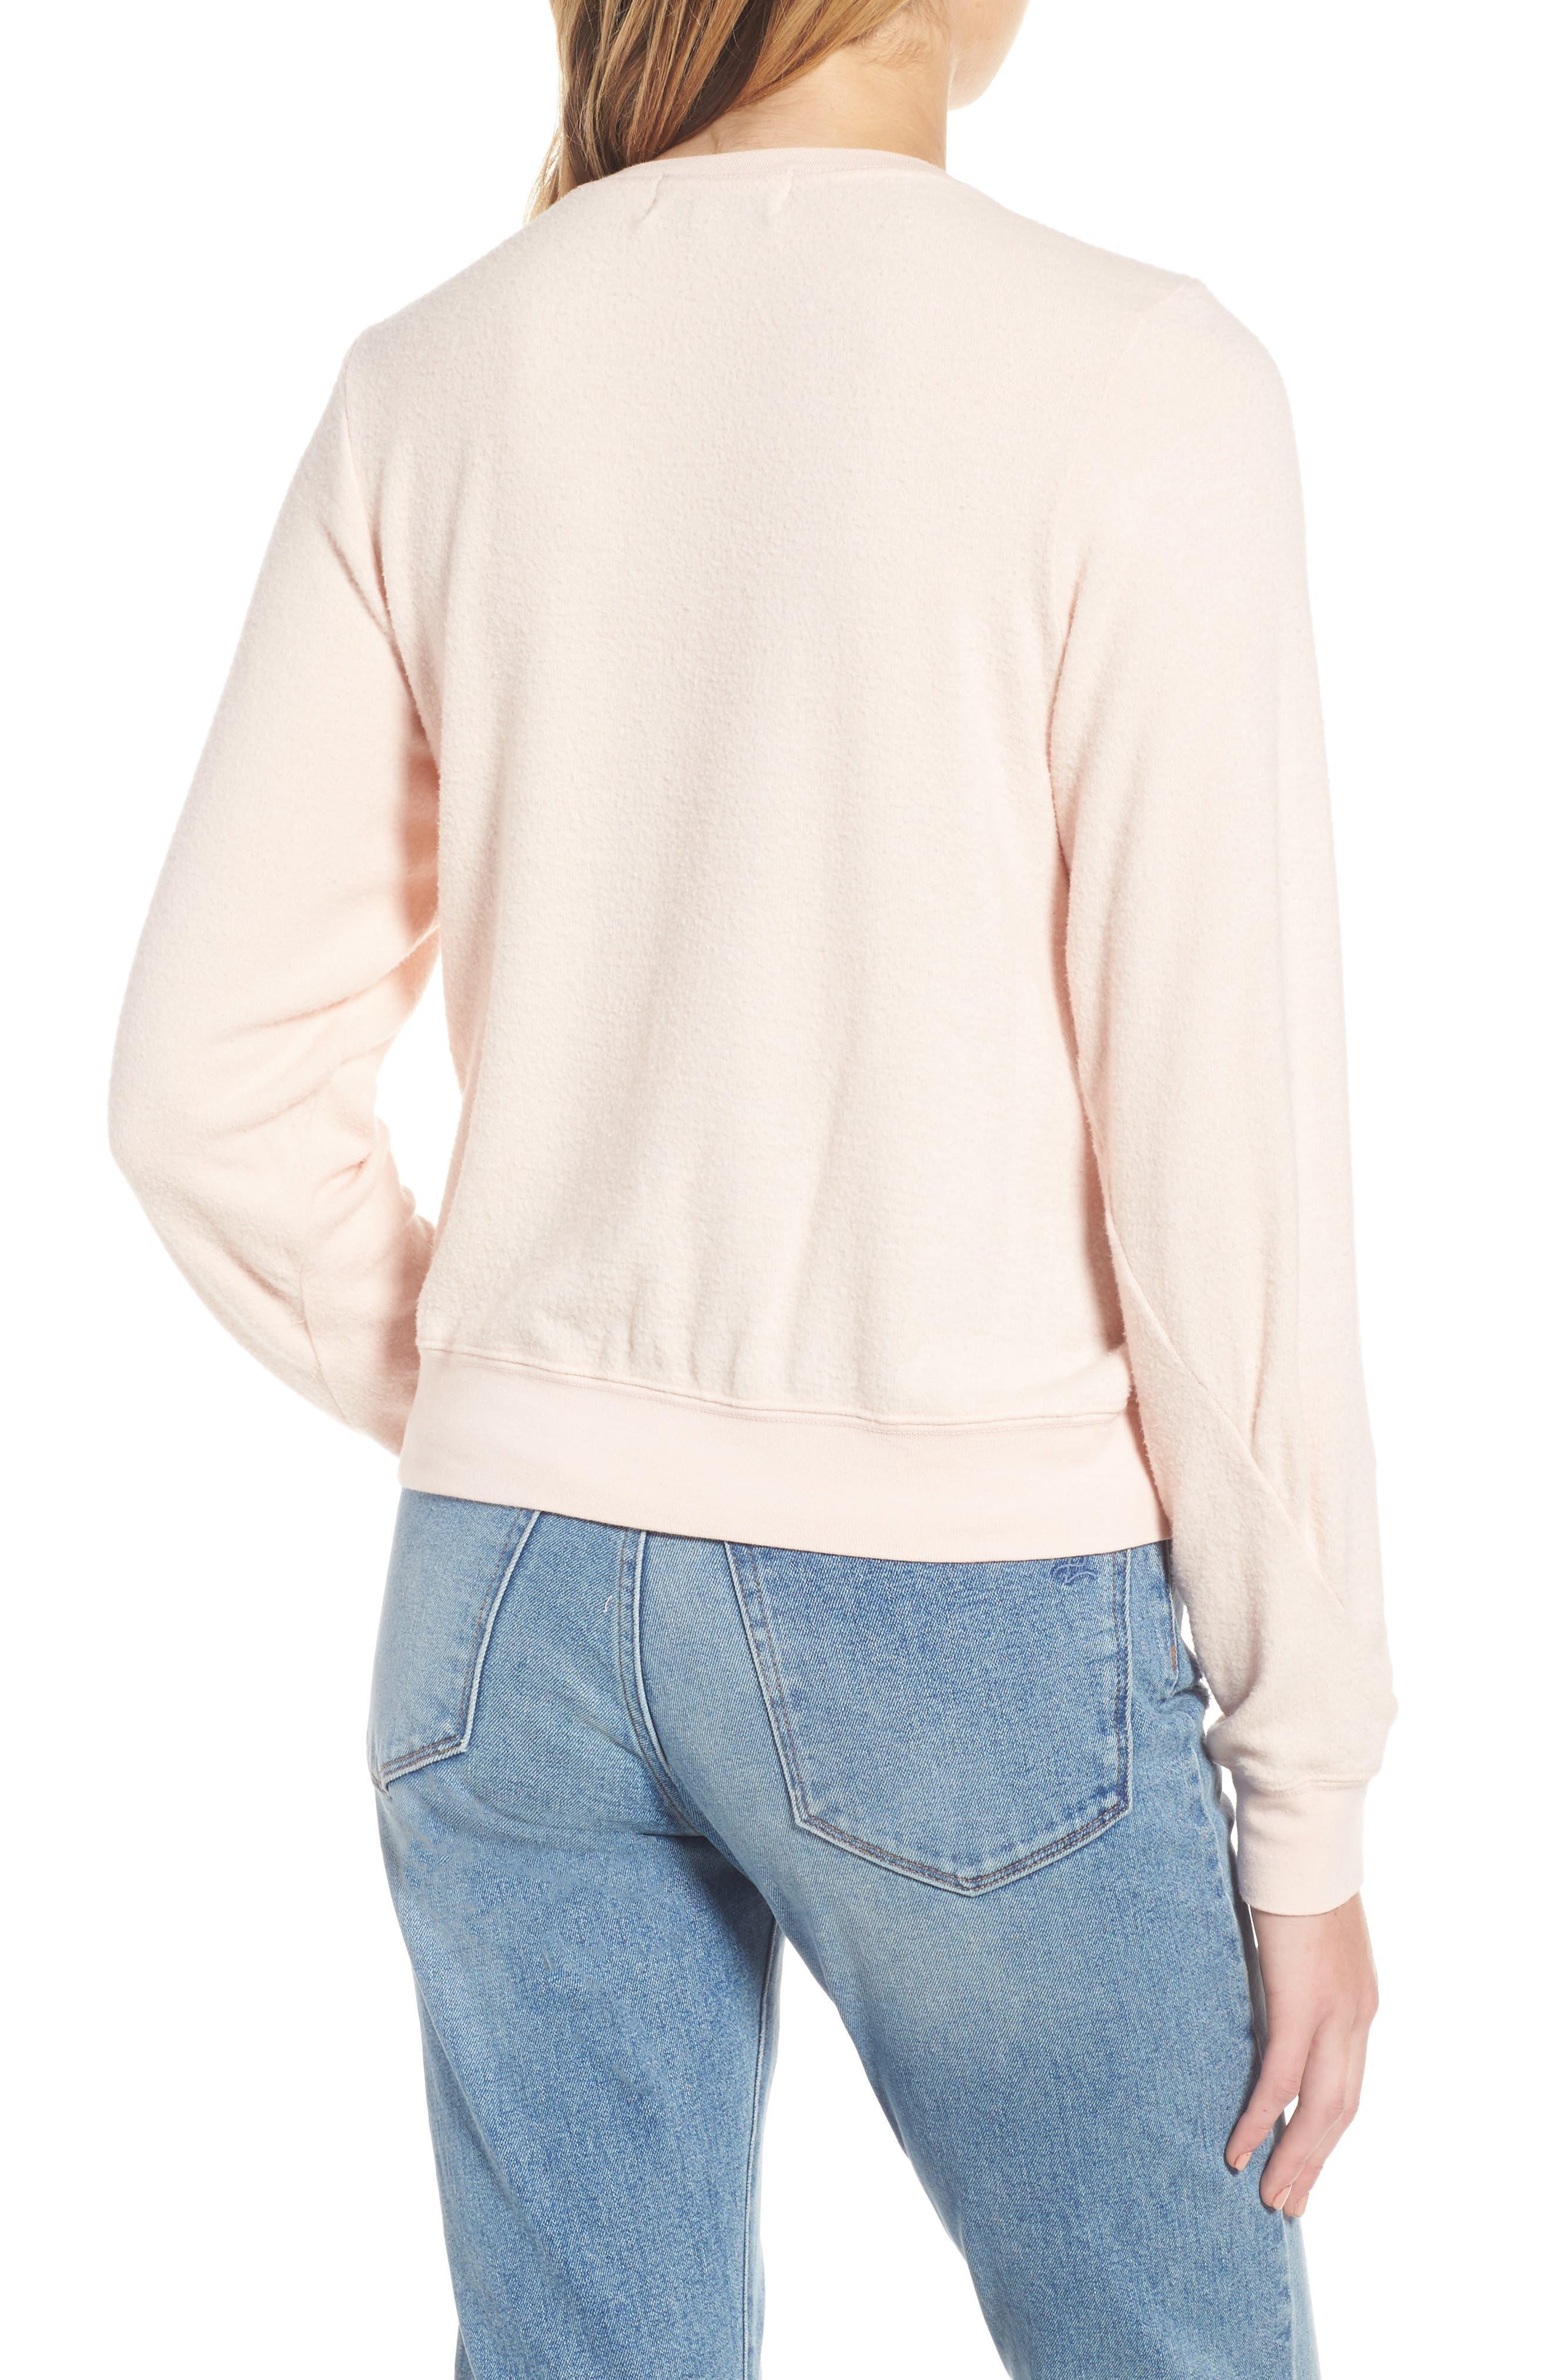 Heart Sweatshirt,                             Alternate thumbnail 2, color,                             650